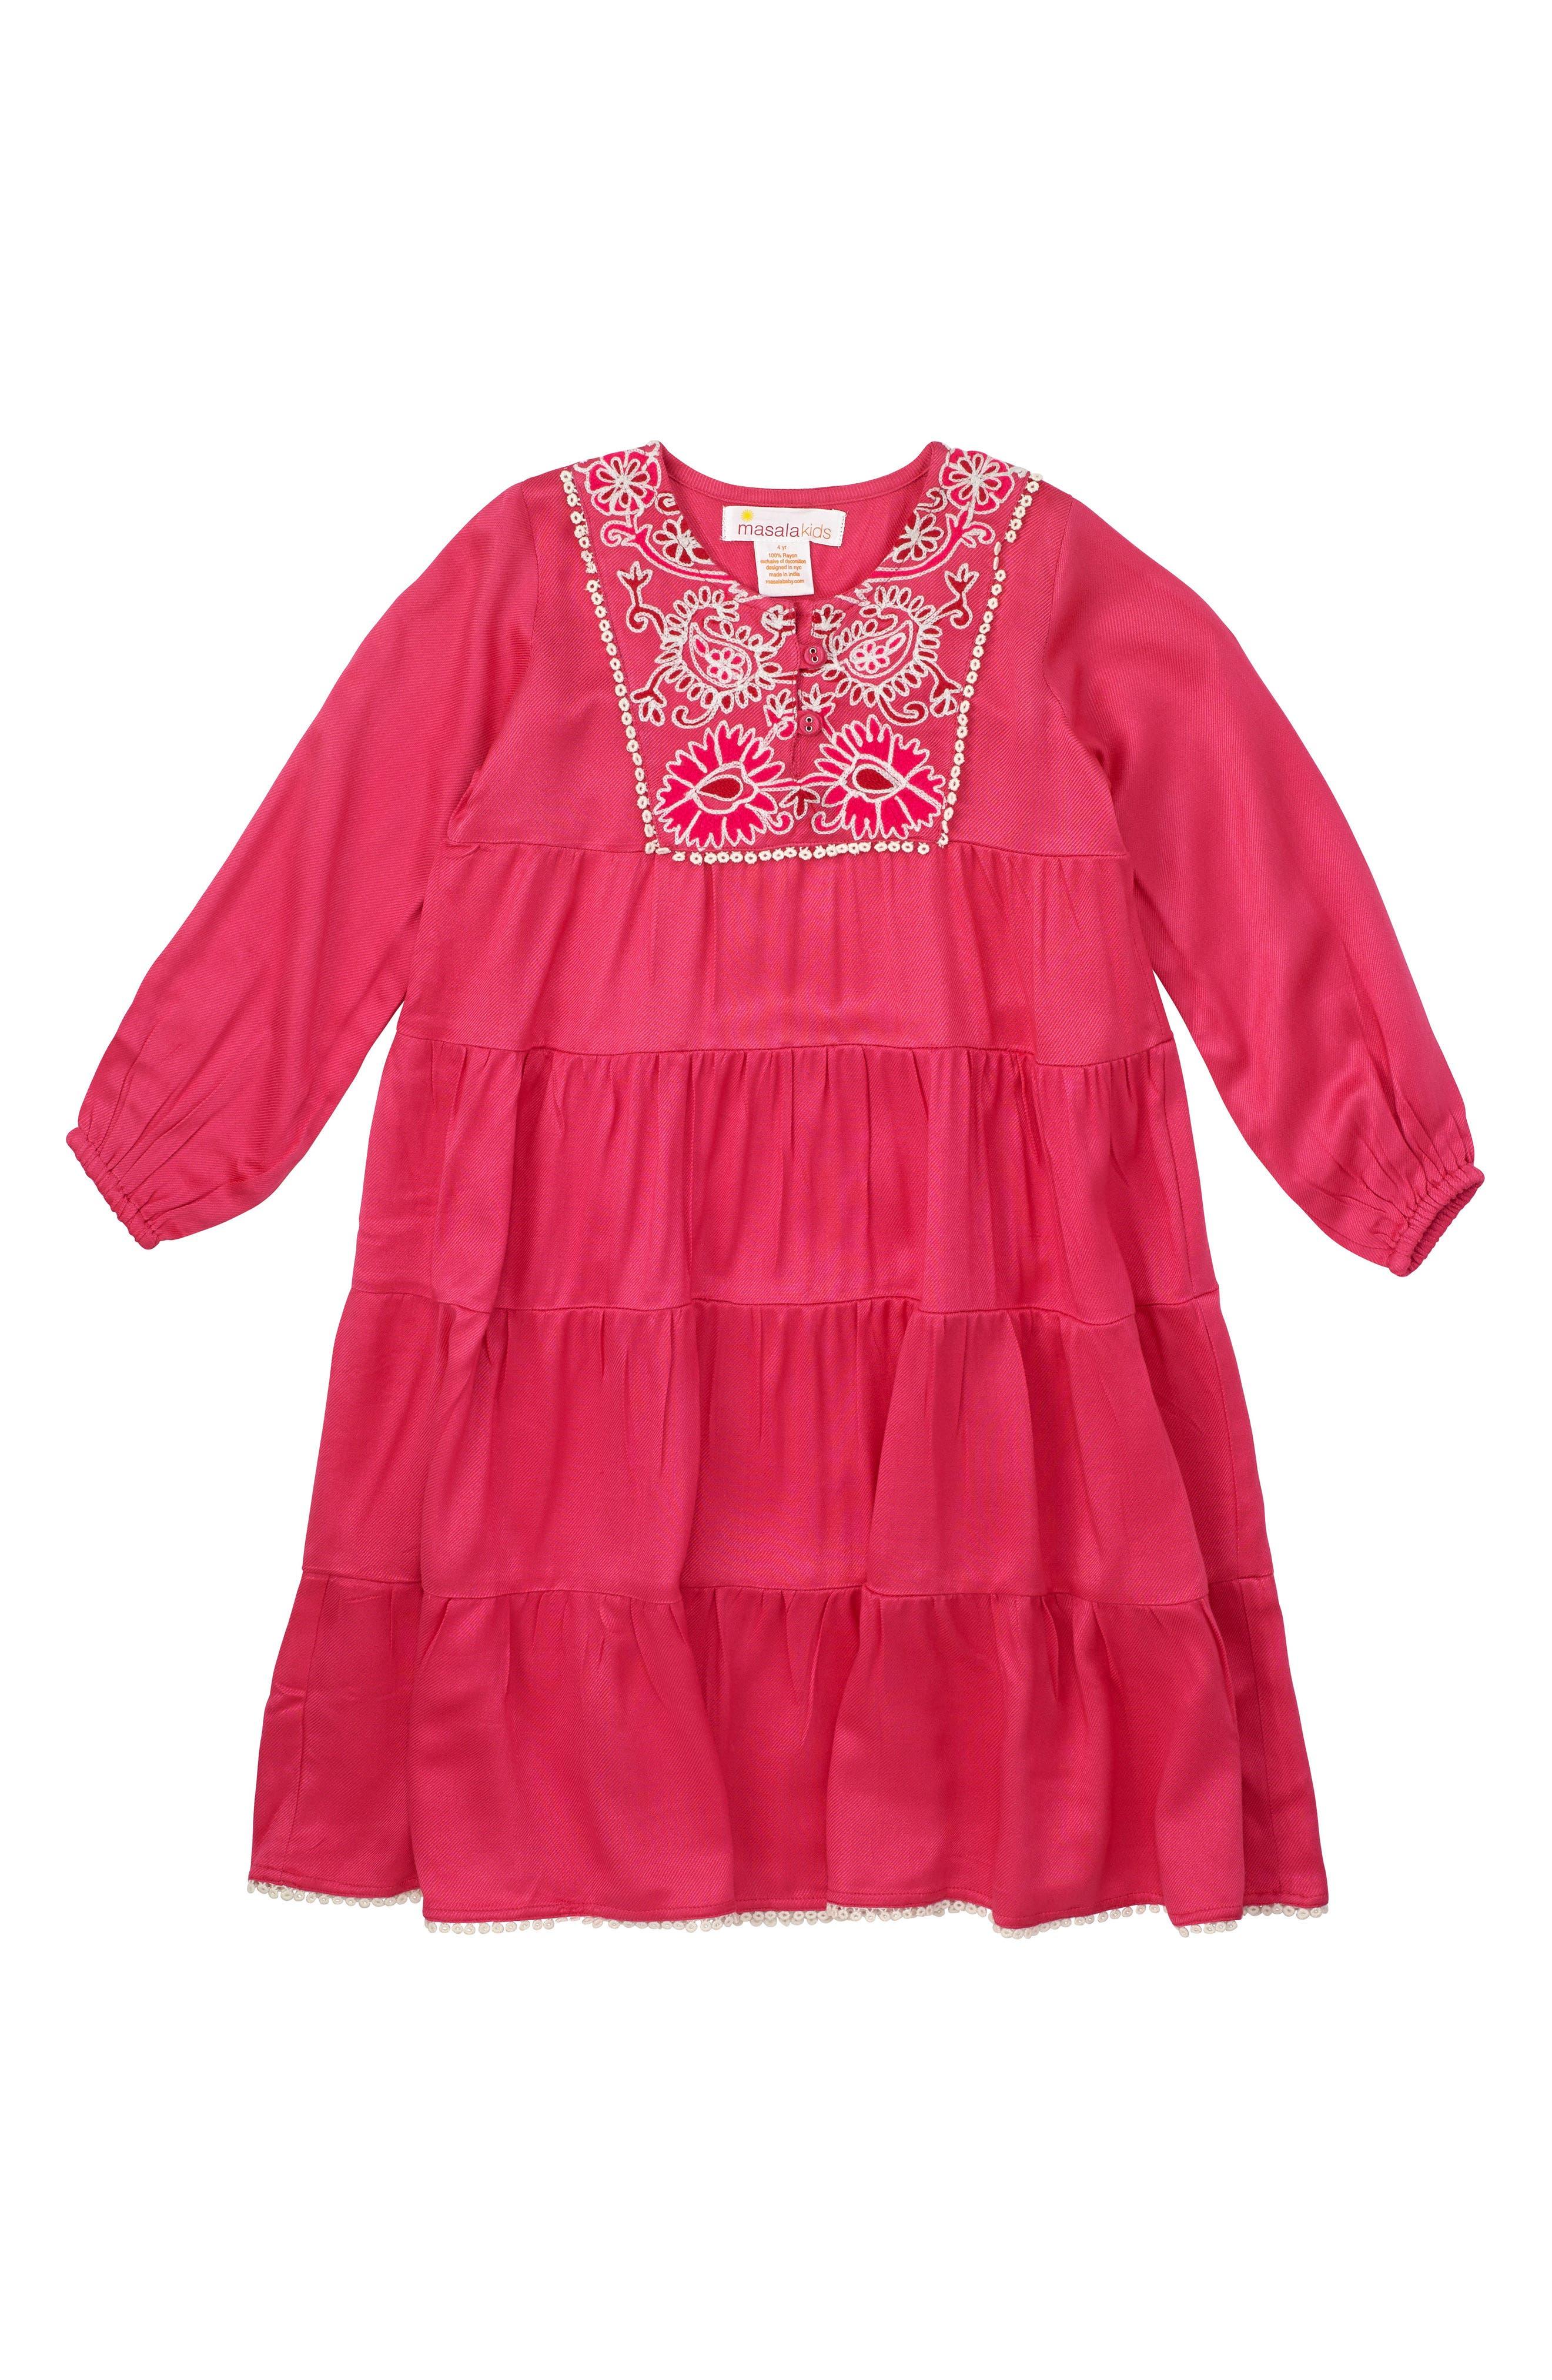 Rose Dress,                             Main thumbnail 1, color,                             Pink